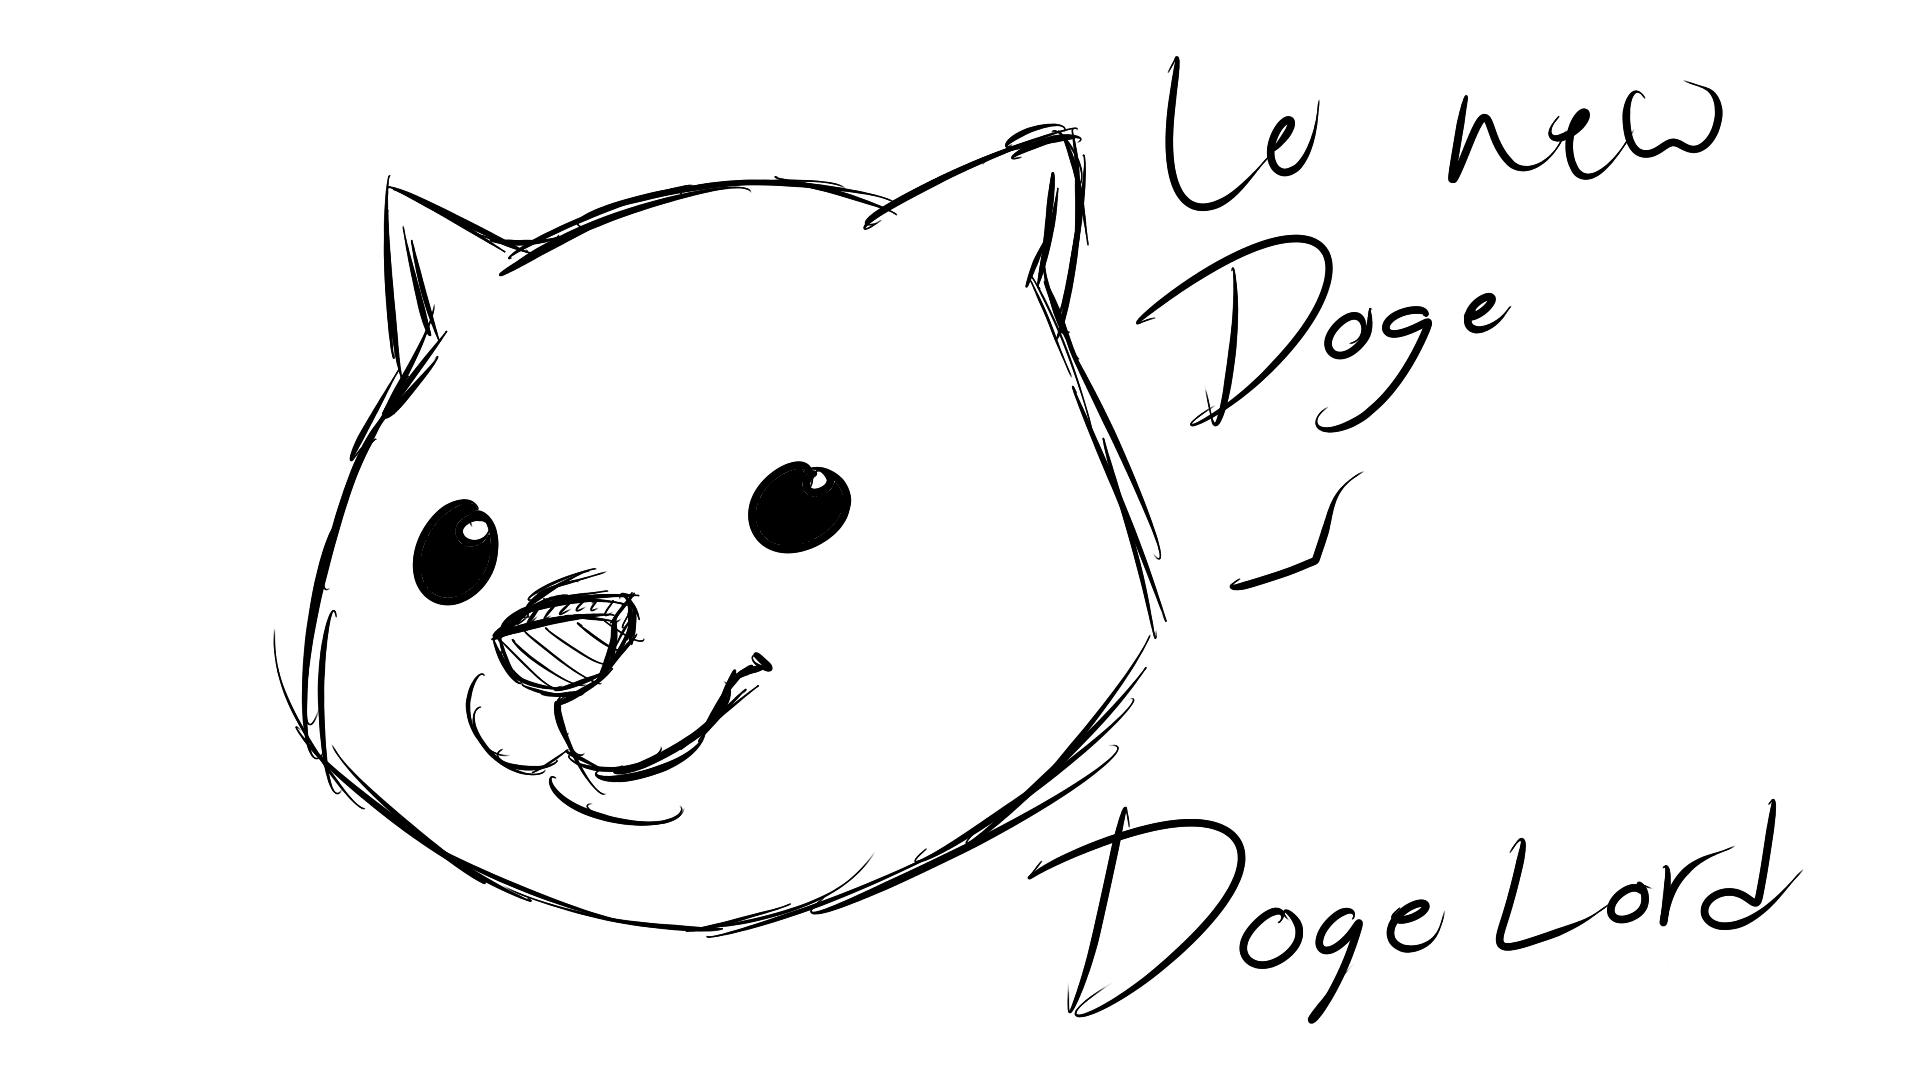 Doge Lord